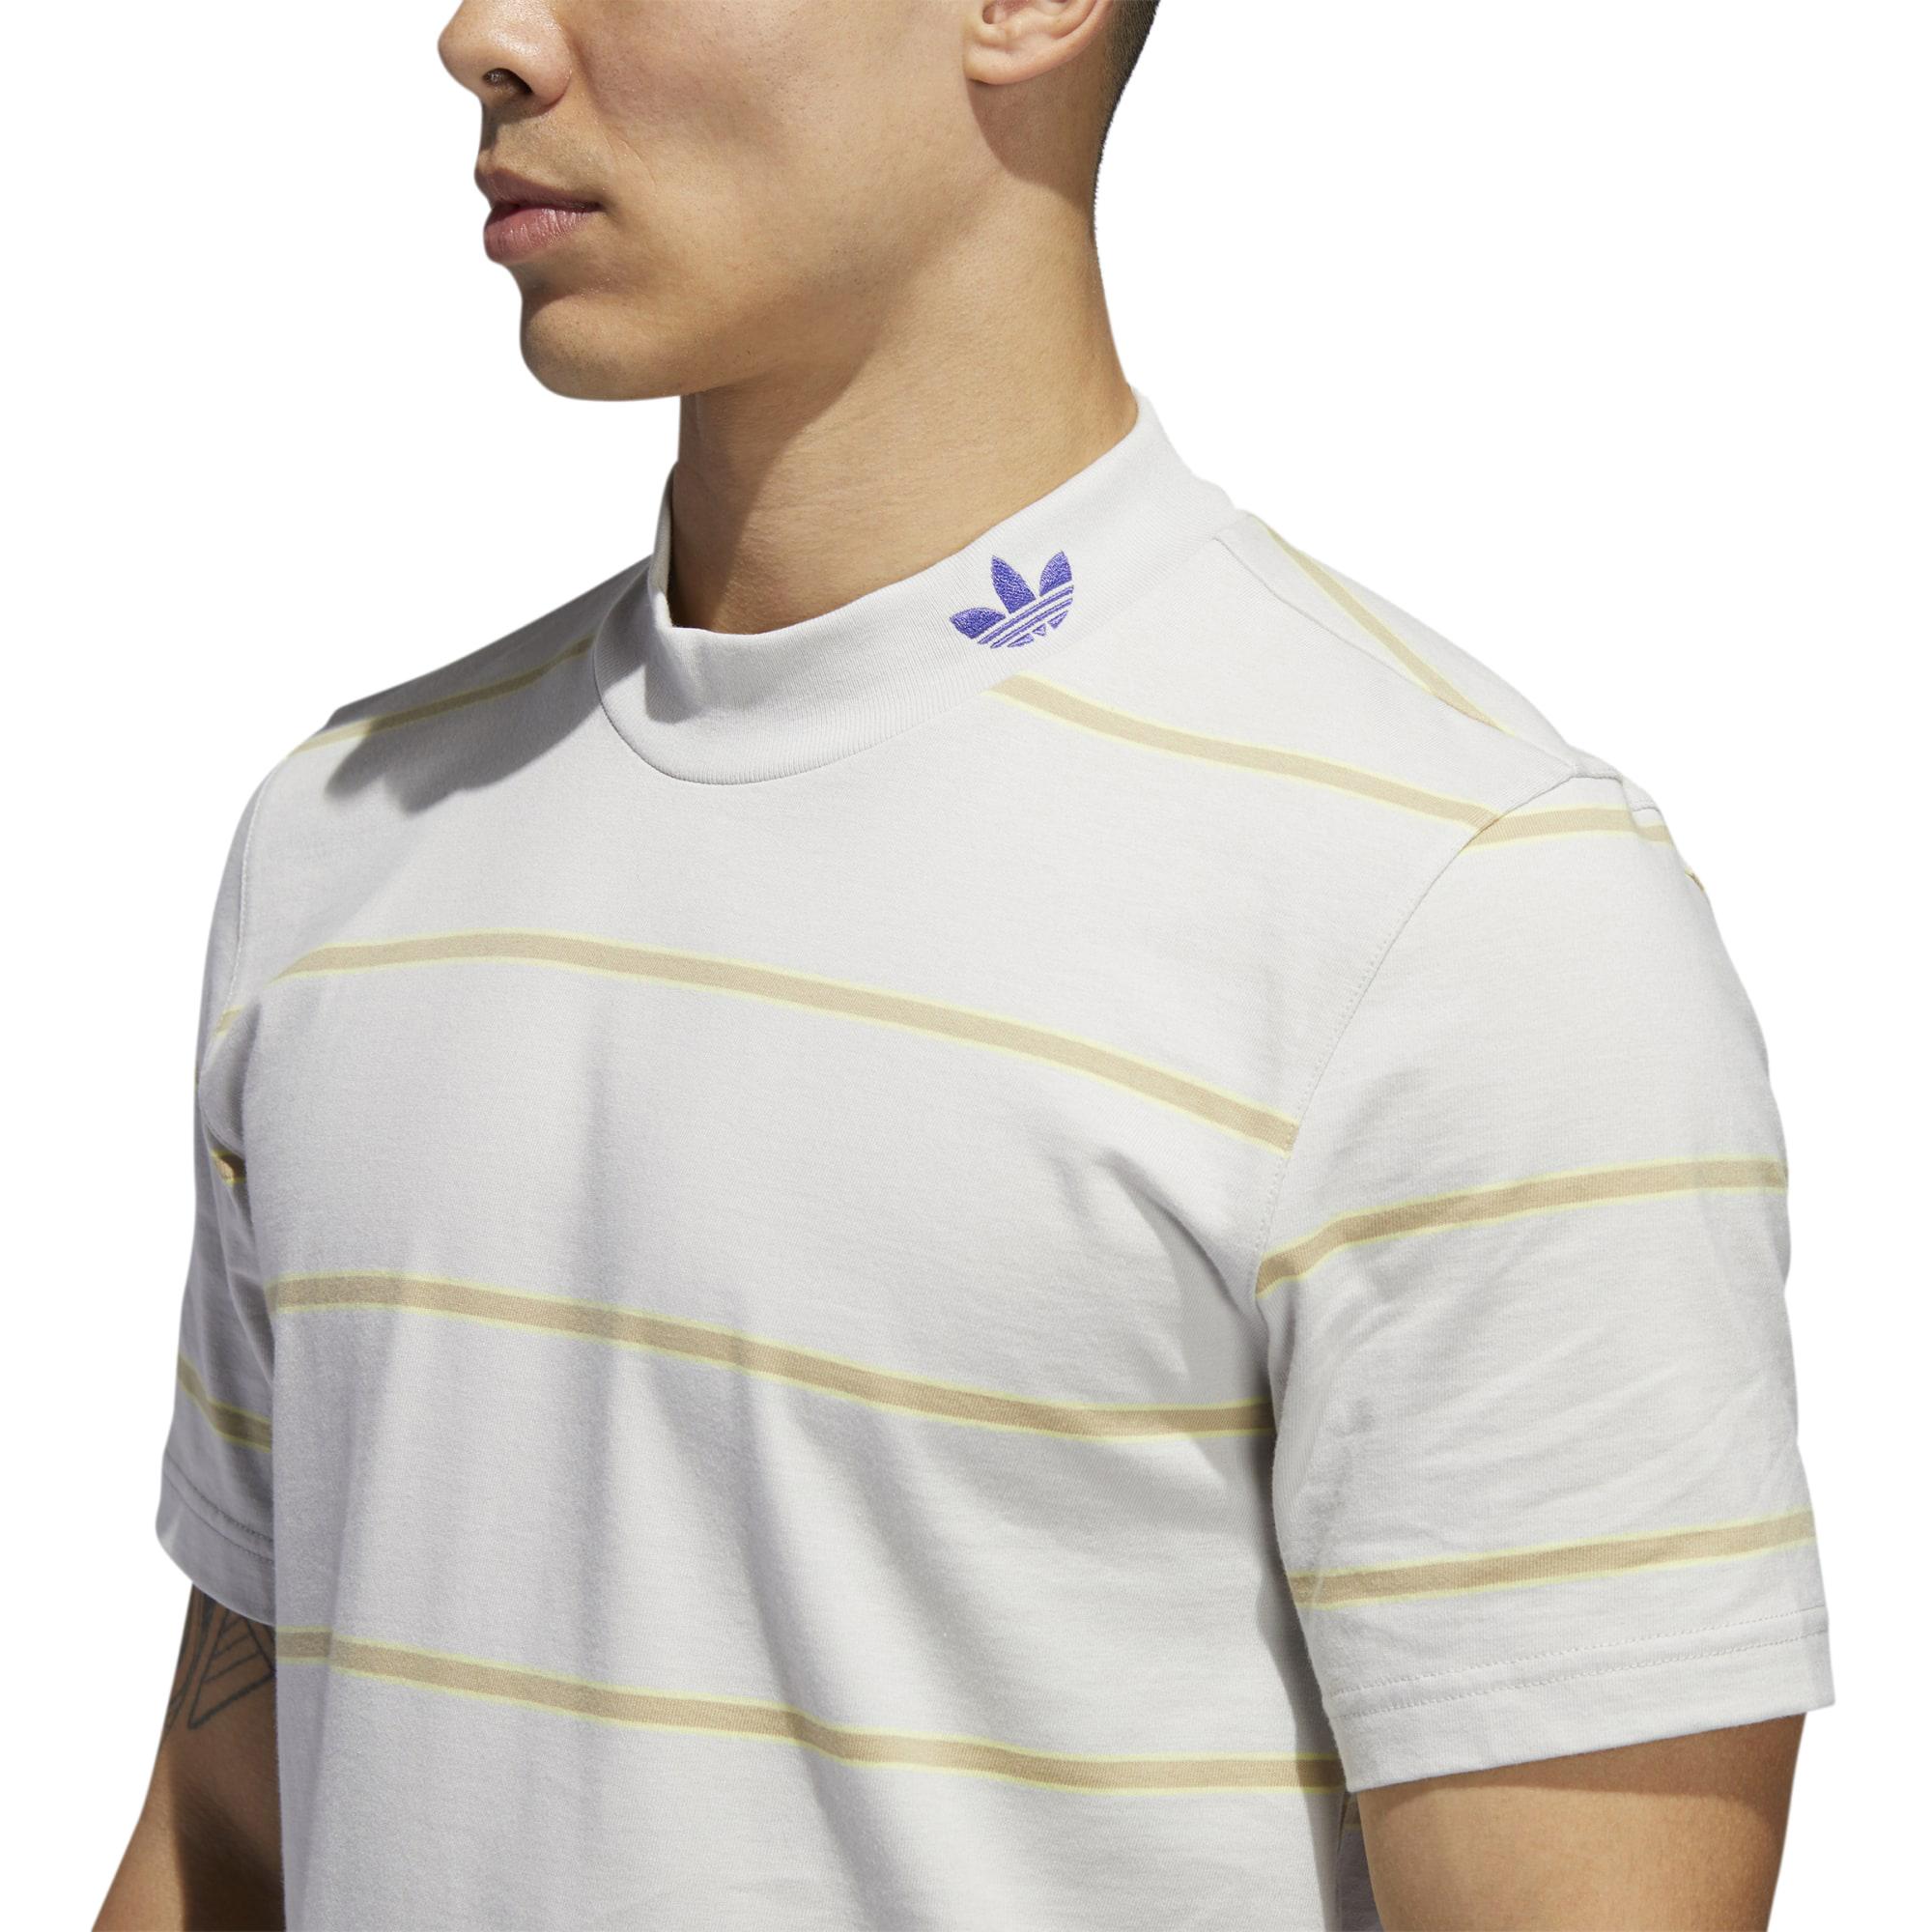 Adidas Men's Mock Eye Yarn Dye Shirt, Grey One/Mesa/Yellow Tint | eBay